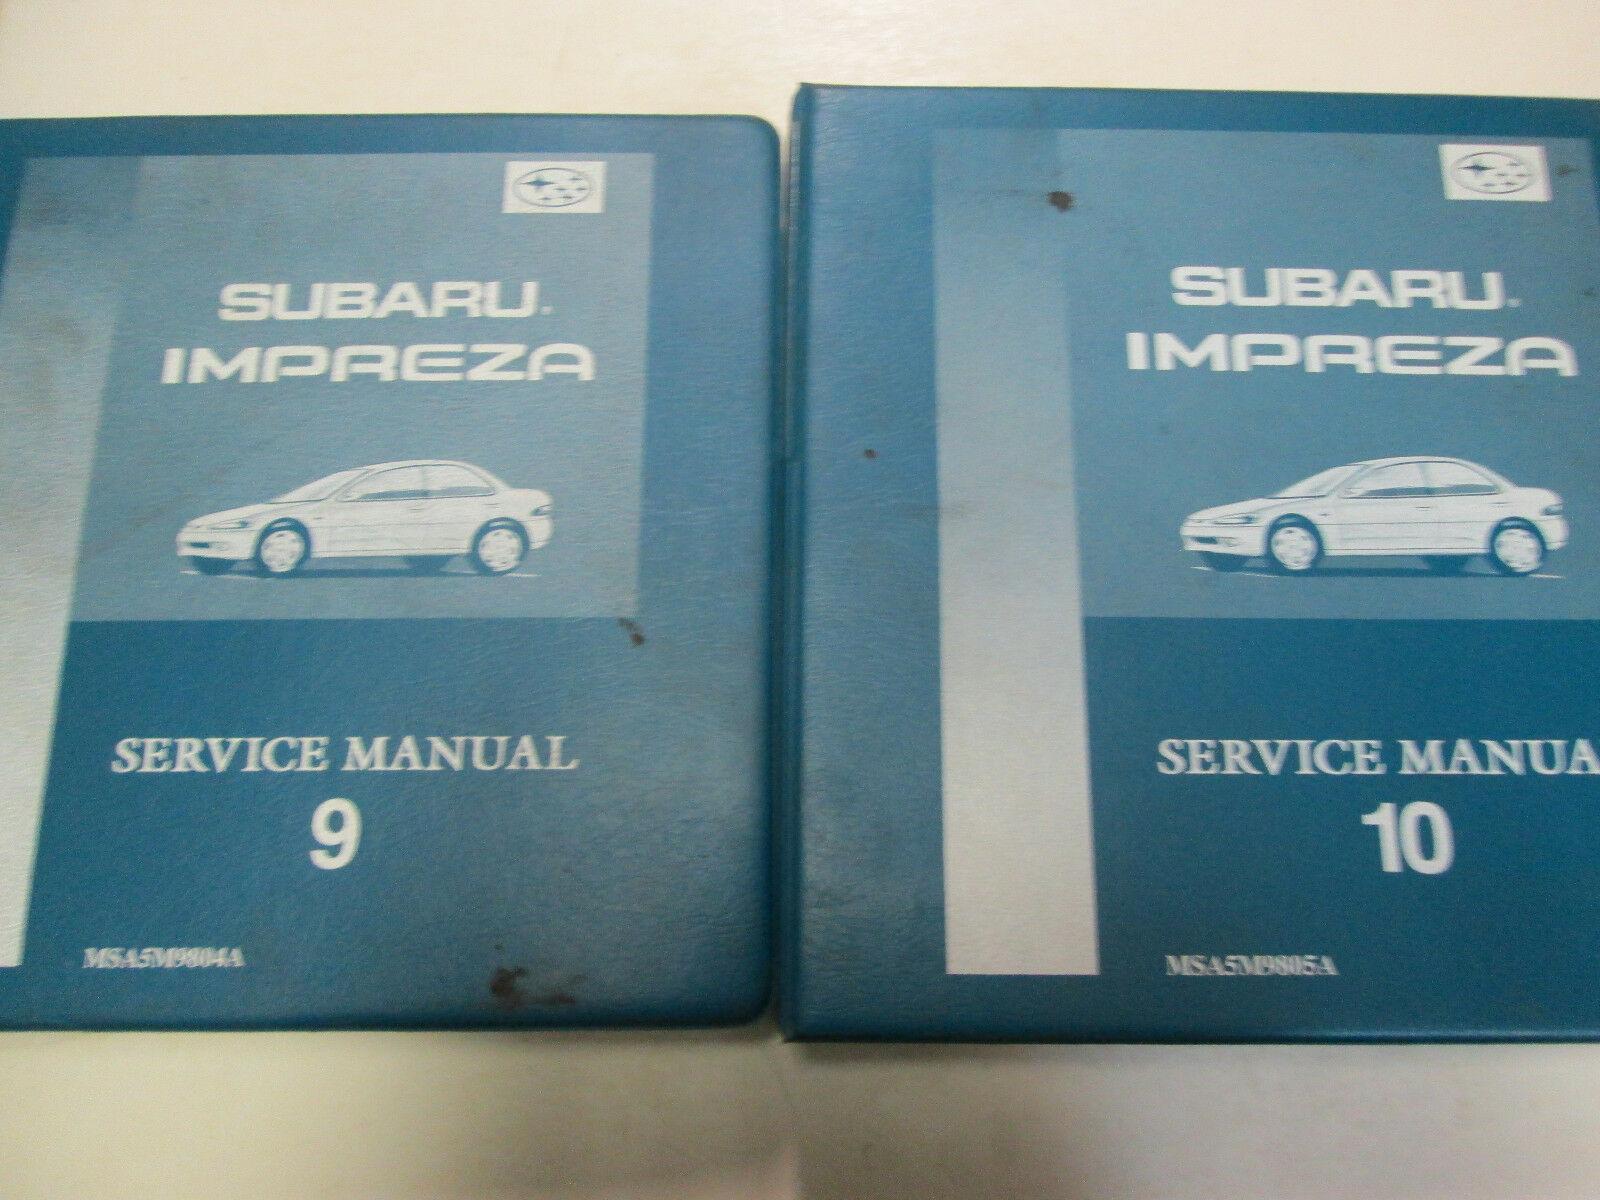 1998 Subaru Impreza Service Manual 2 Volume Set FACTORY FEO BOOKS BINDER ***